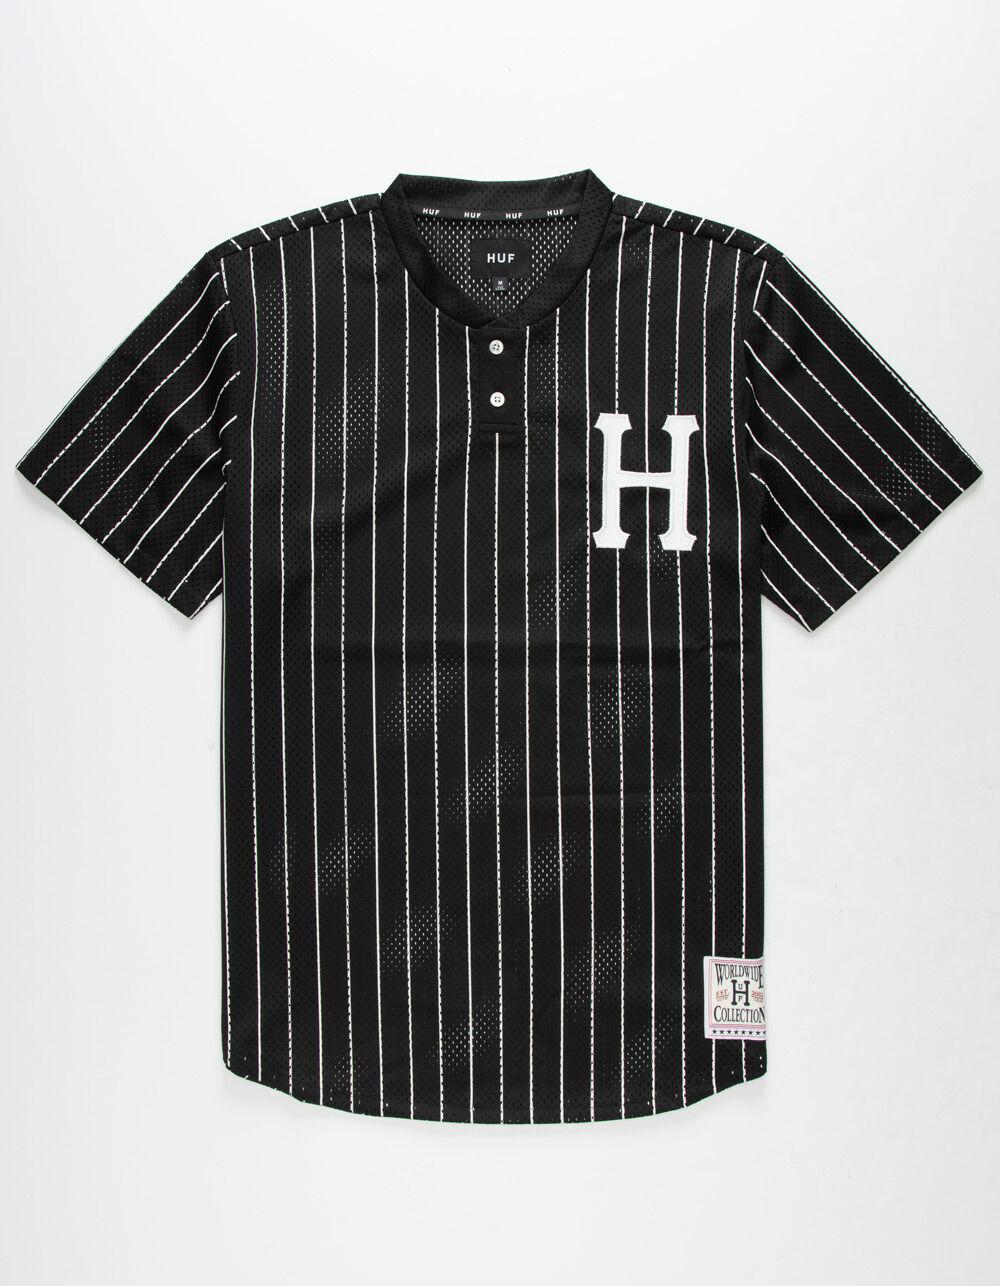 HUF Bronx Henley Black Jersey